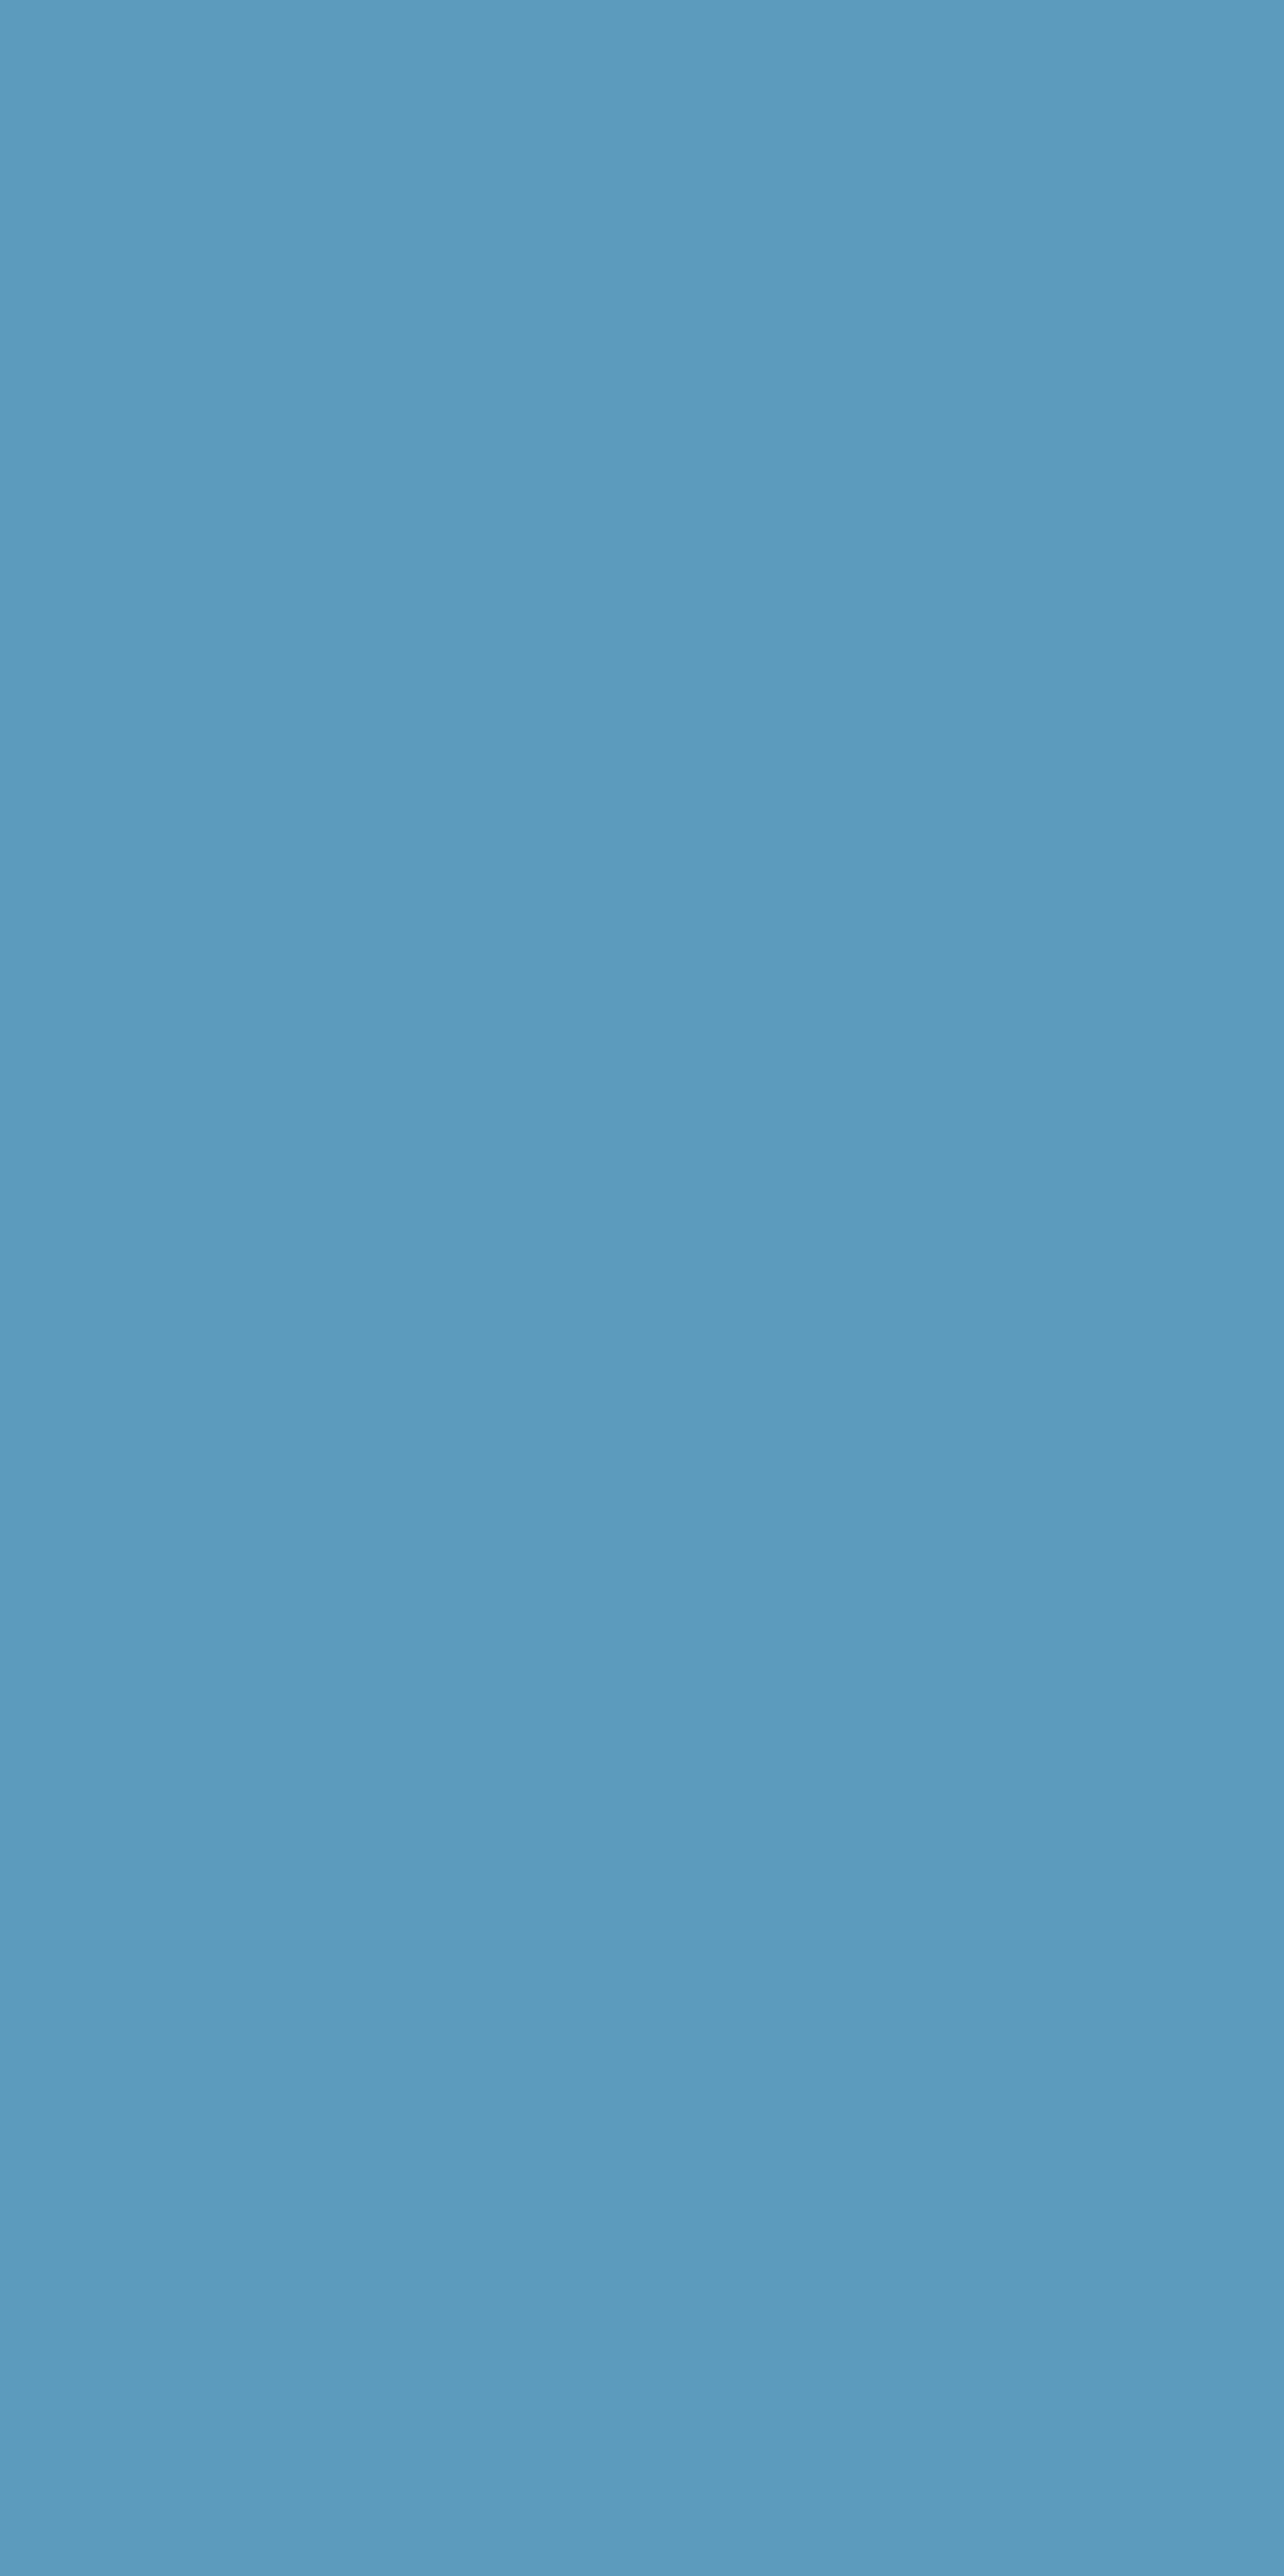 Pacific Blue iphone wallpaper idownloadblog bgirija303